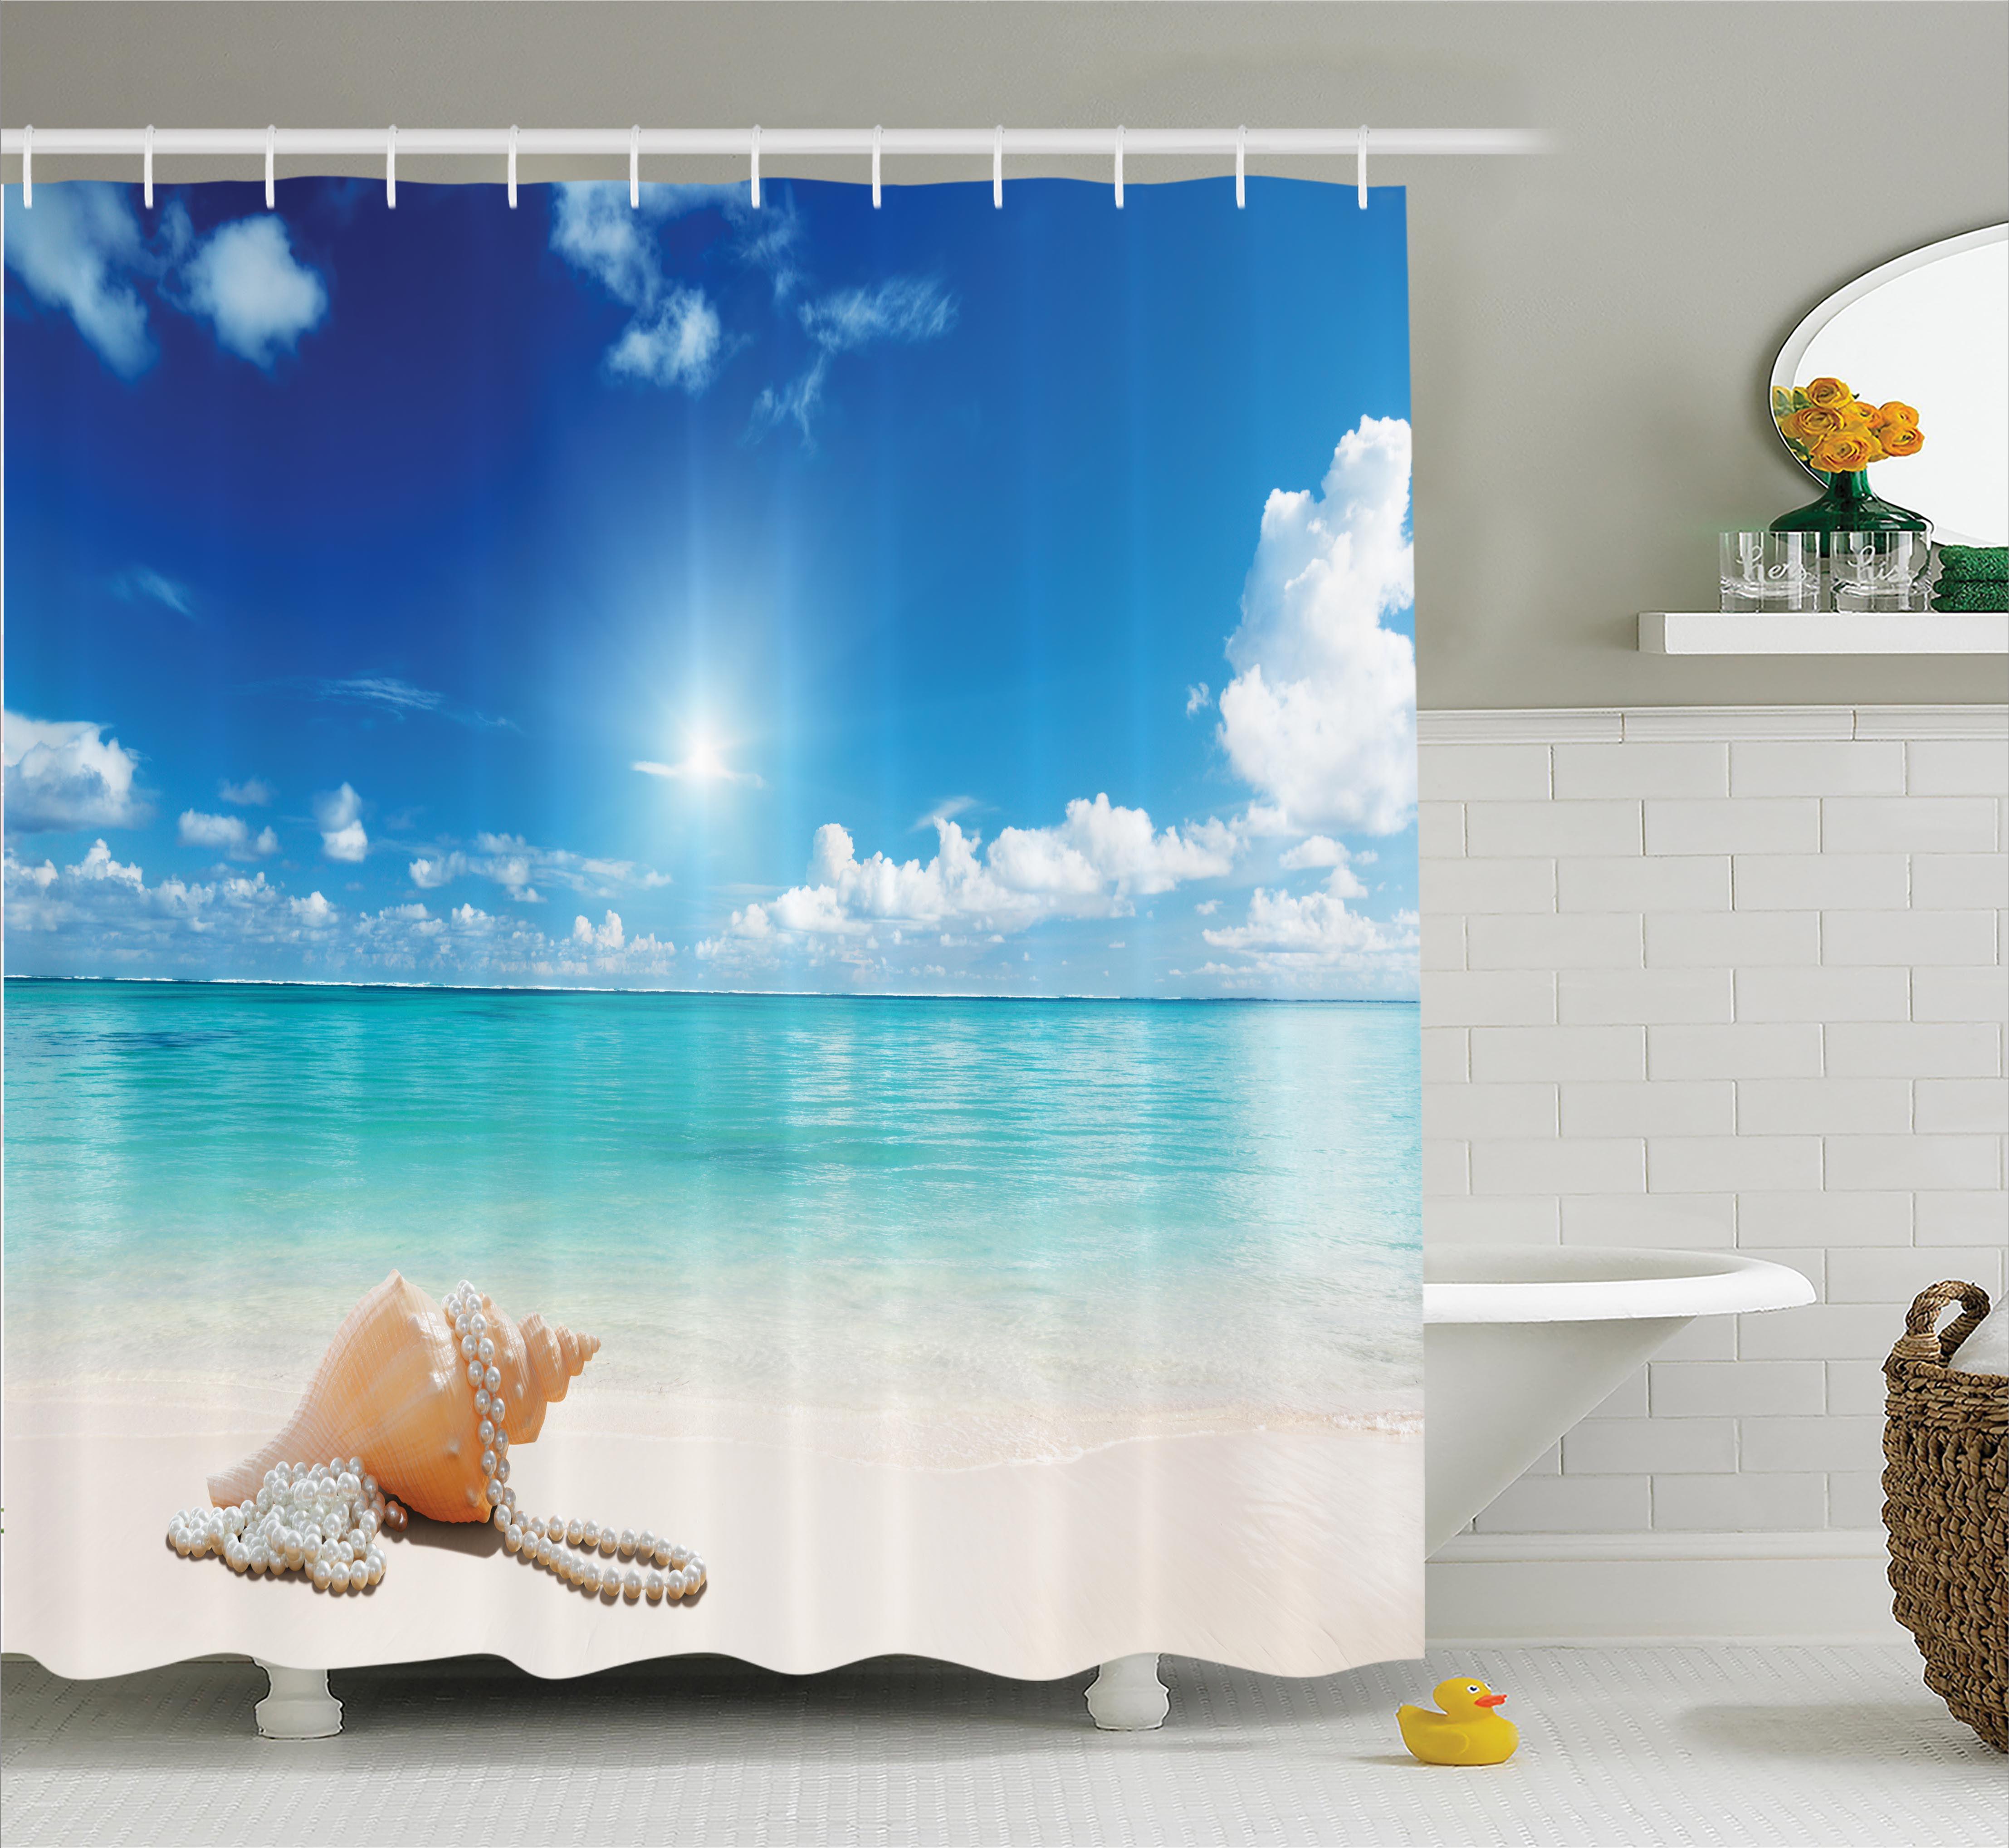 Tropical Scenery Shower Curtain 3d Window Beach Themed Sandy